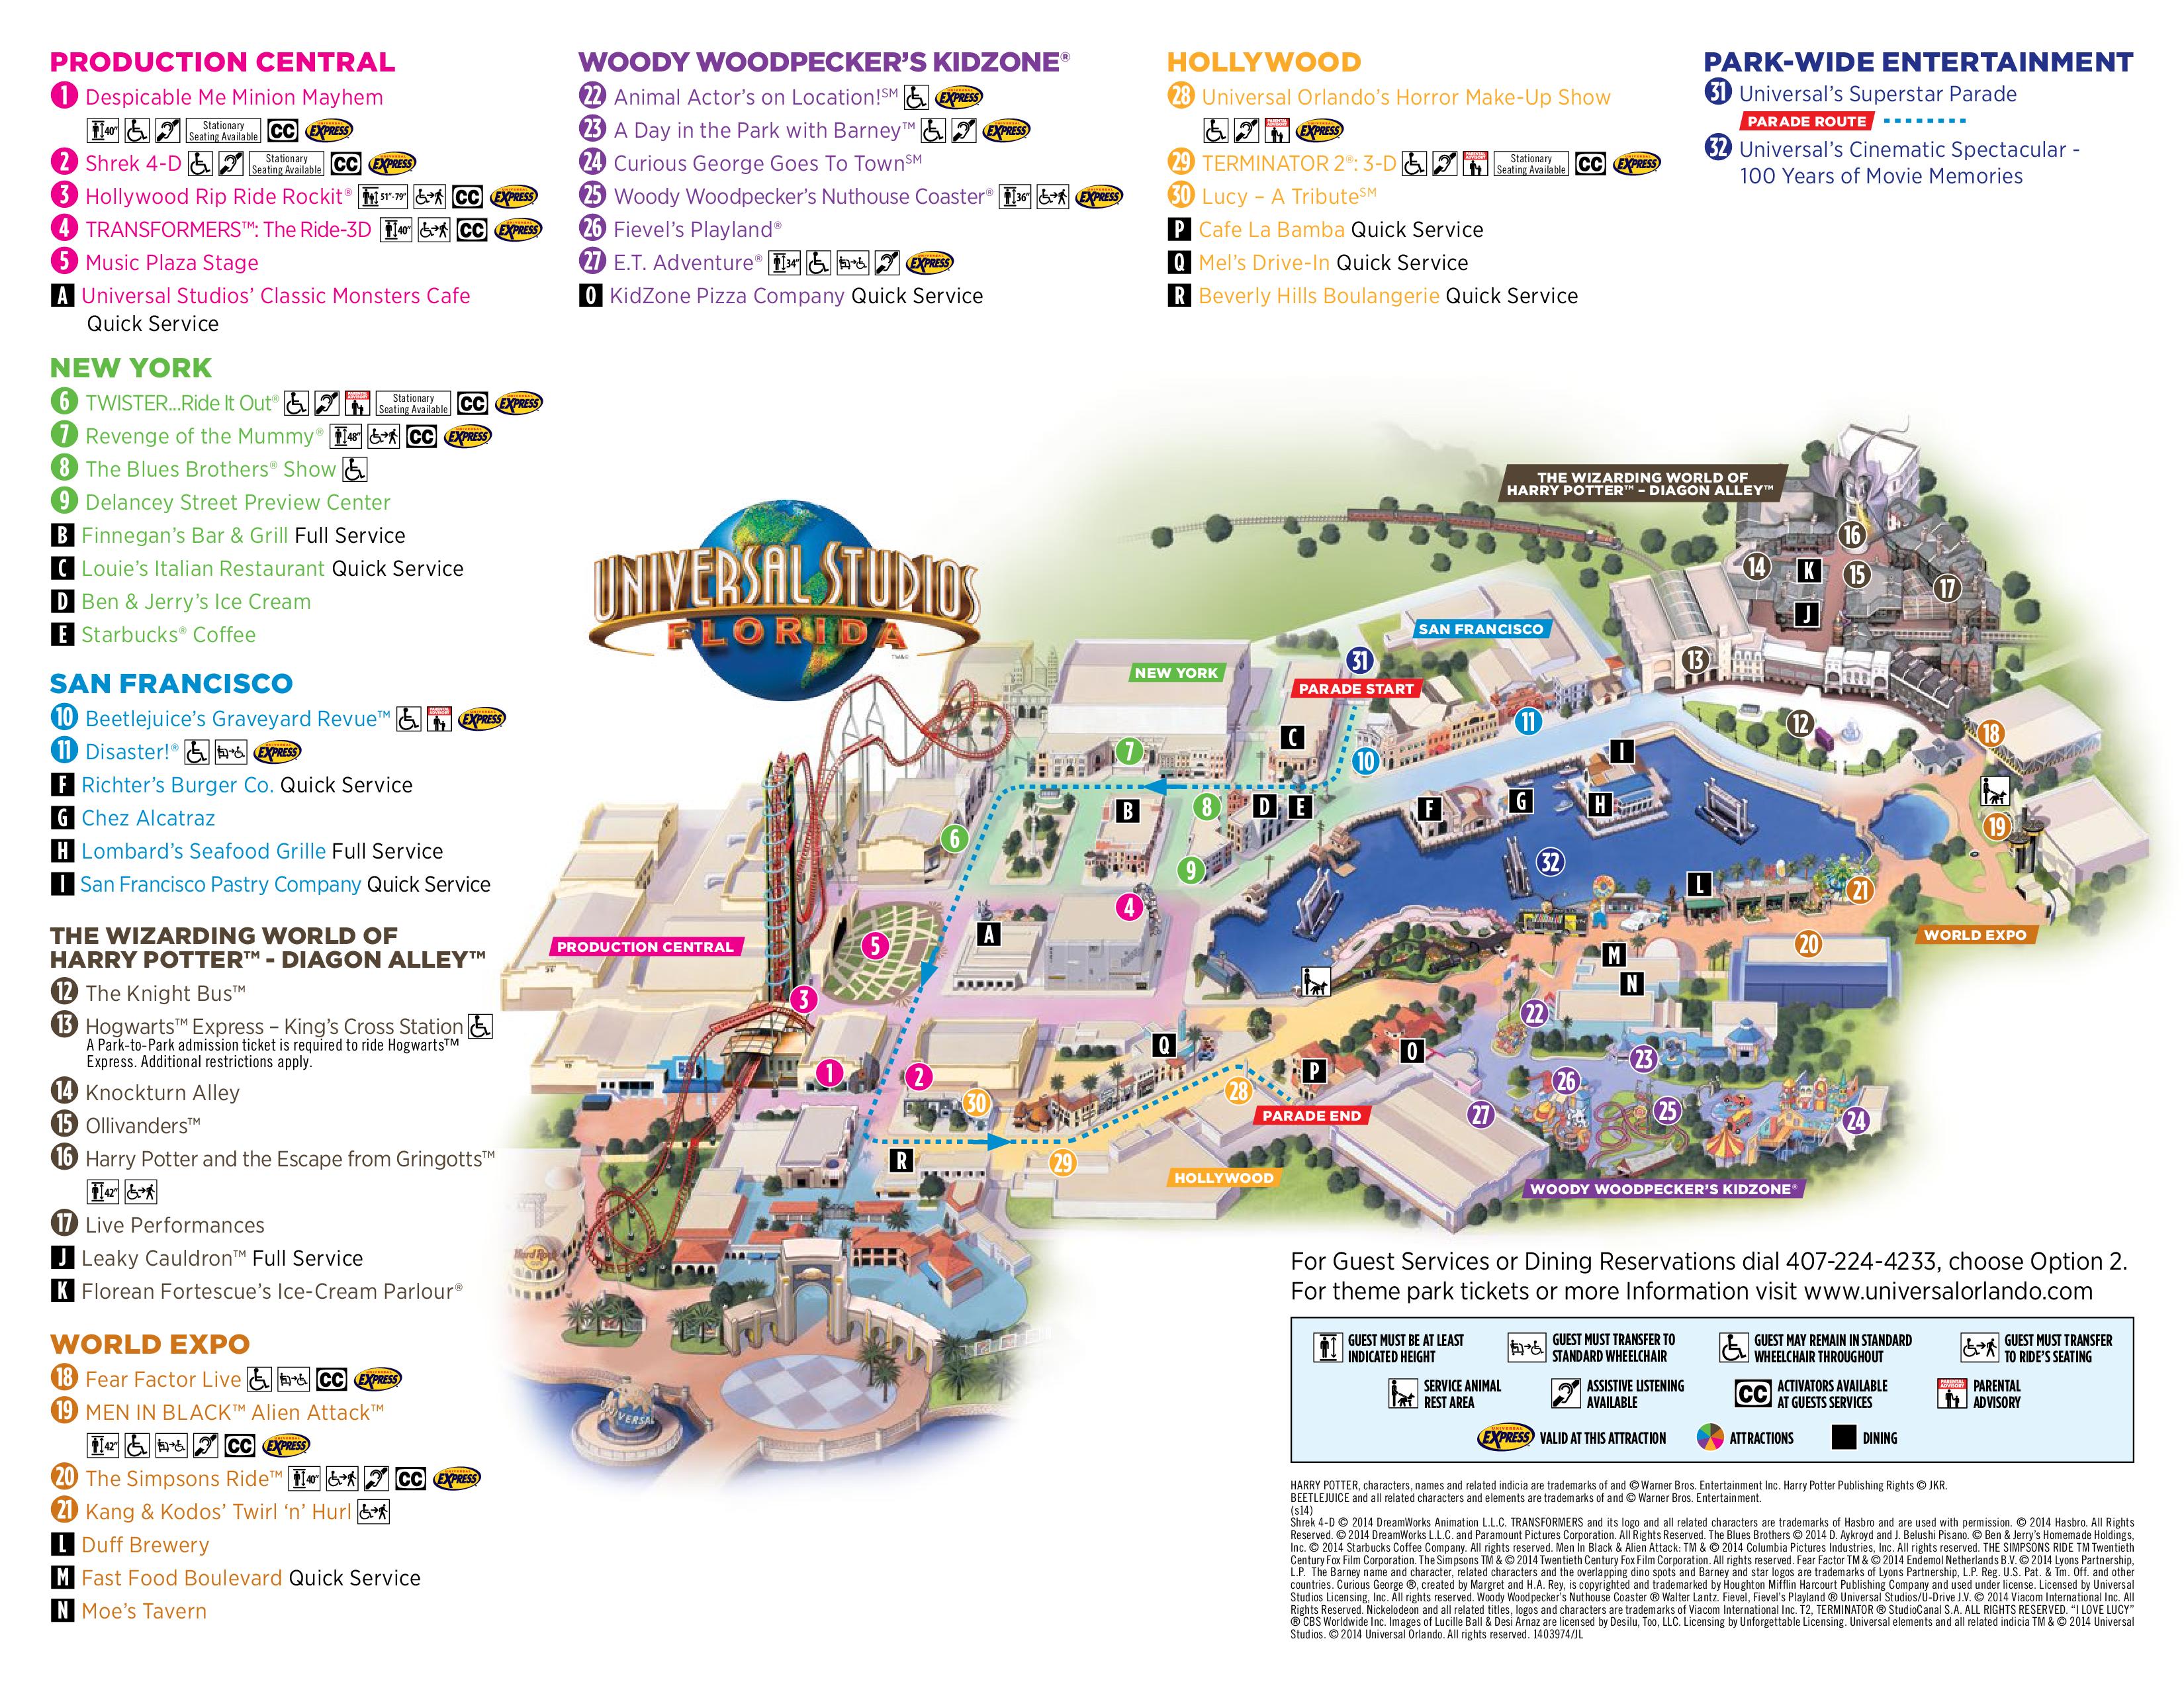 Universal Studios Florida Map 2018 Universal Studios Map in 2020   Universal studios orlando trip